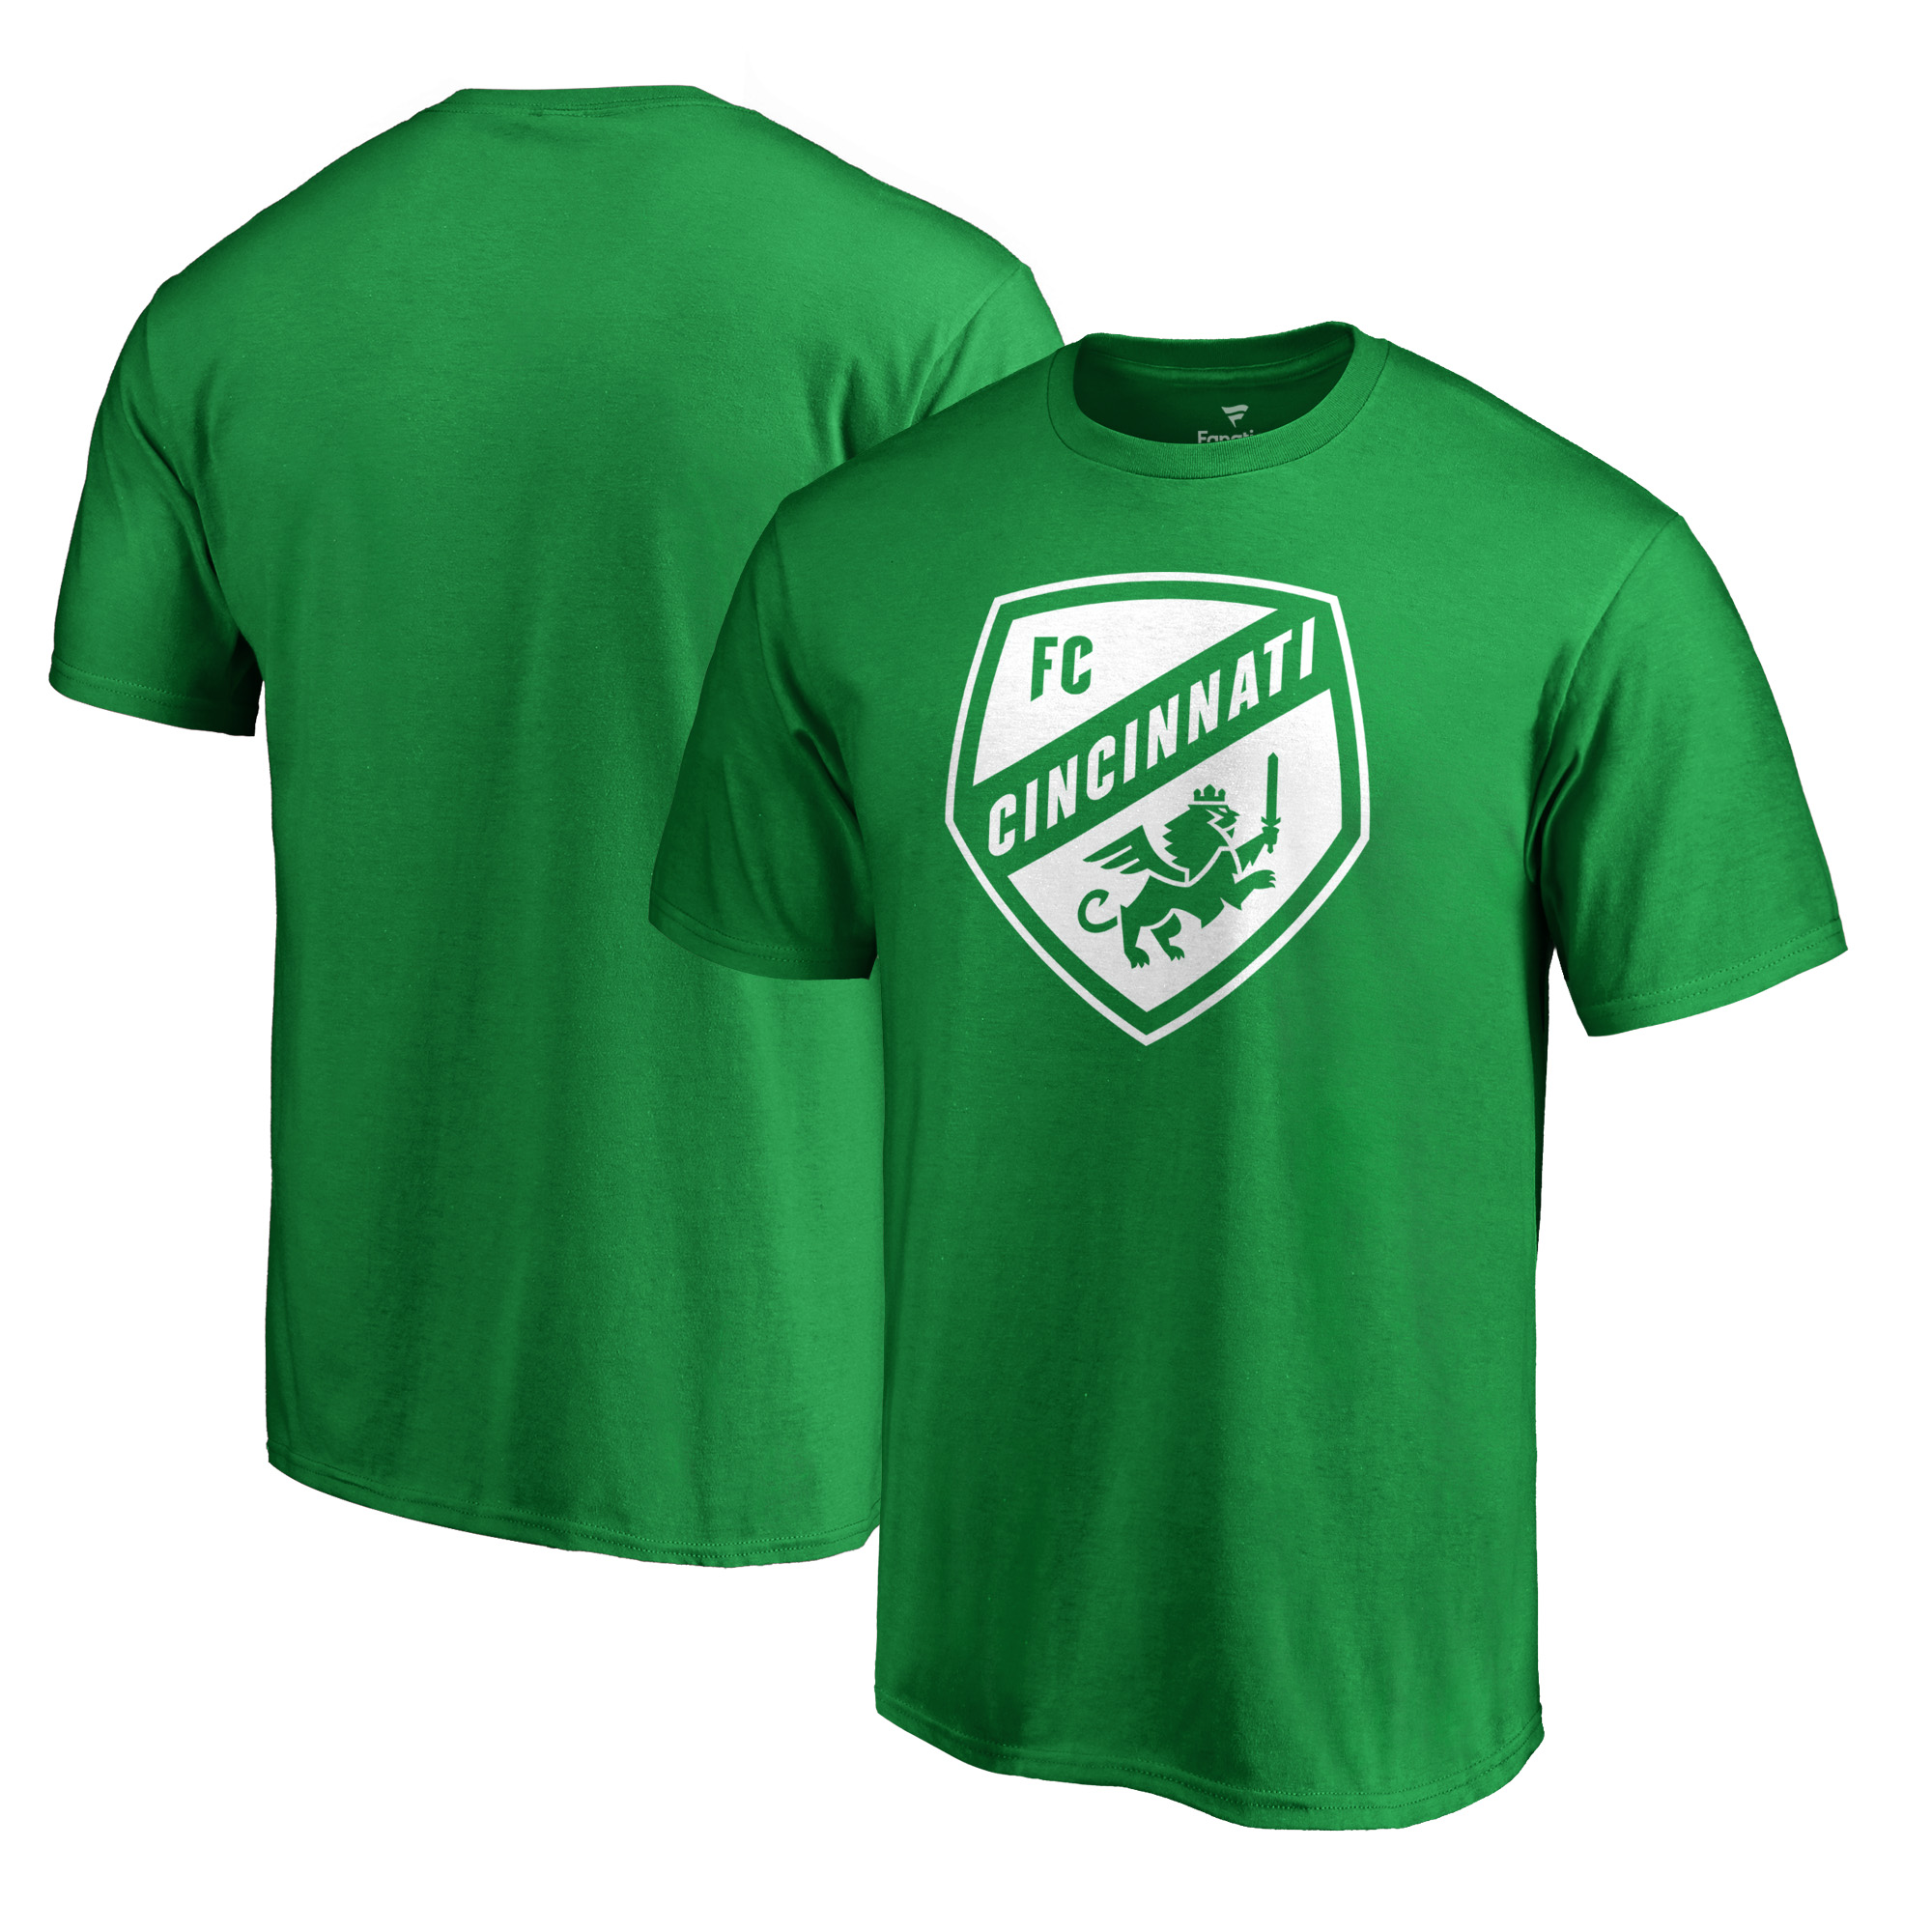 FC Cincinnati Fanatics Branded St. Patrick's Day White Logo T-Shirt - Kelly Green